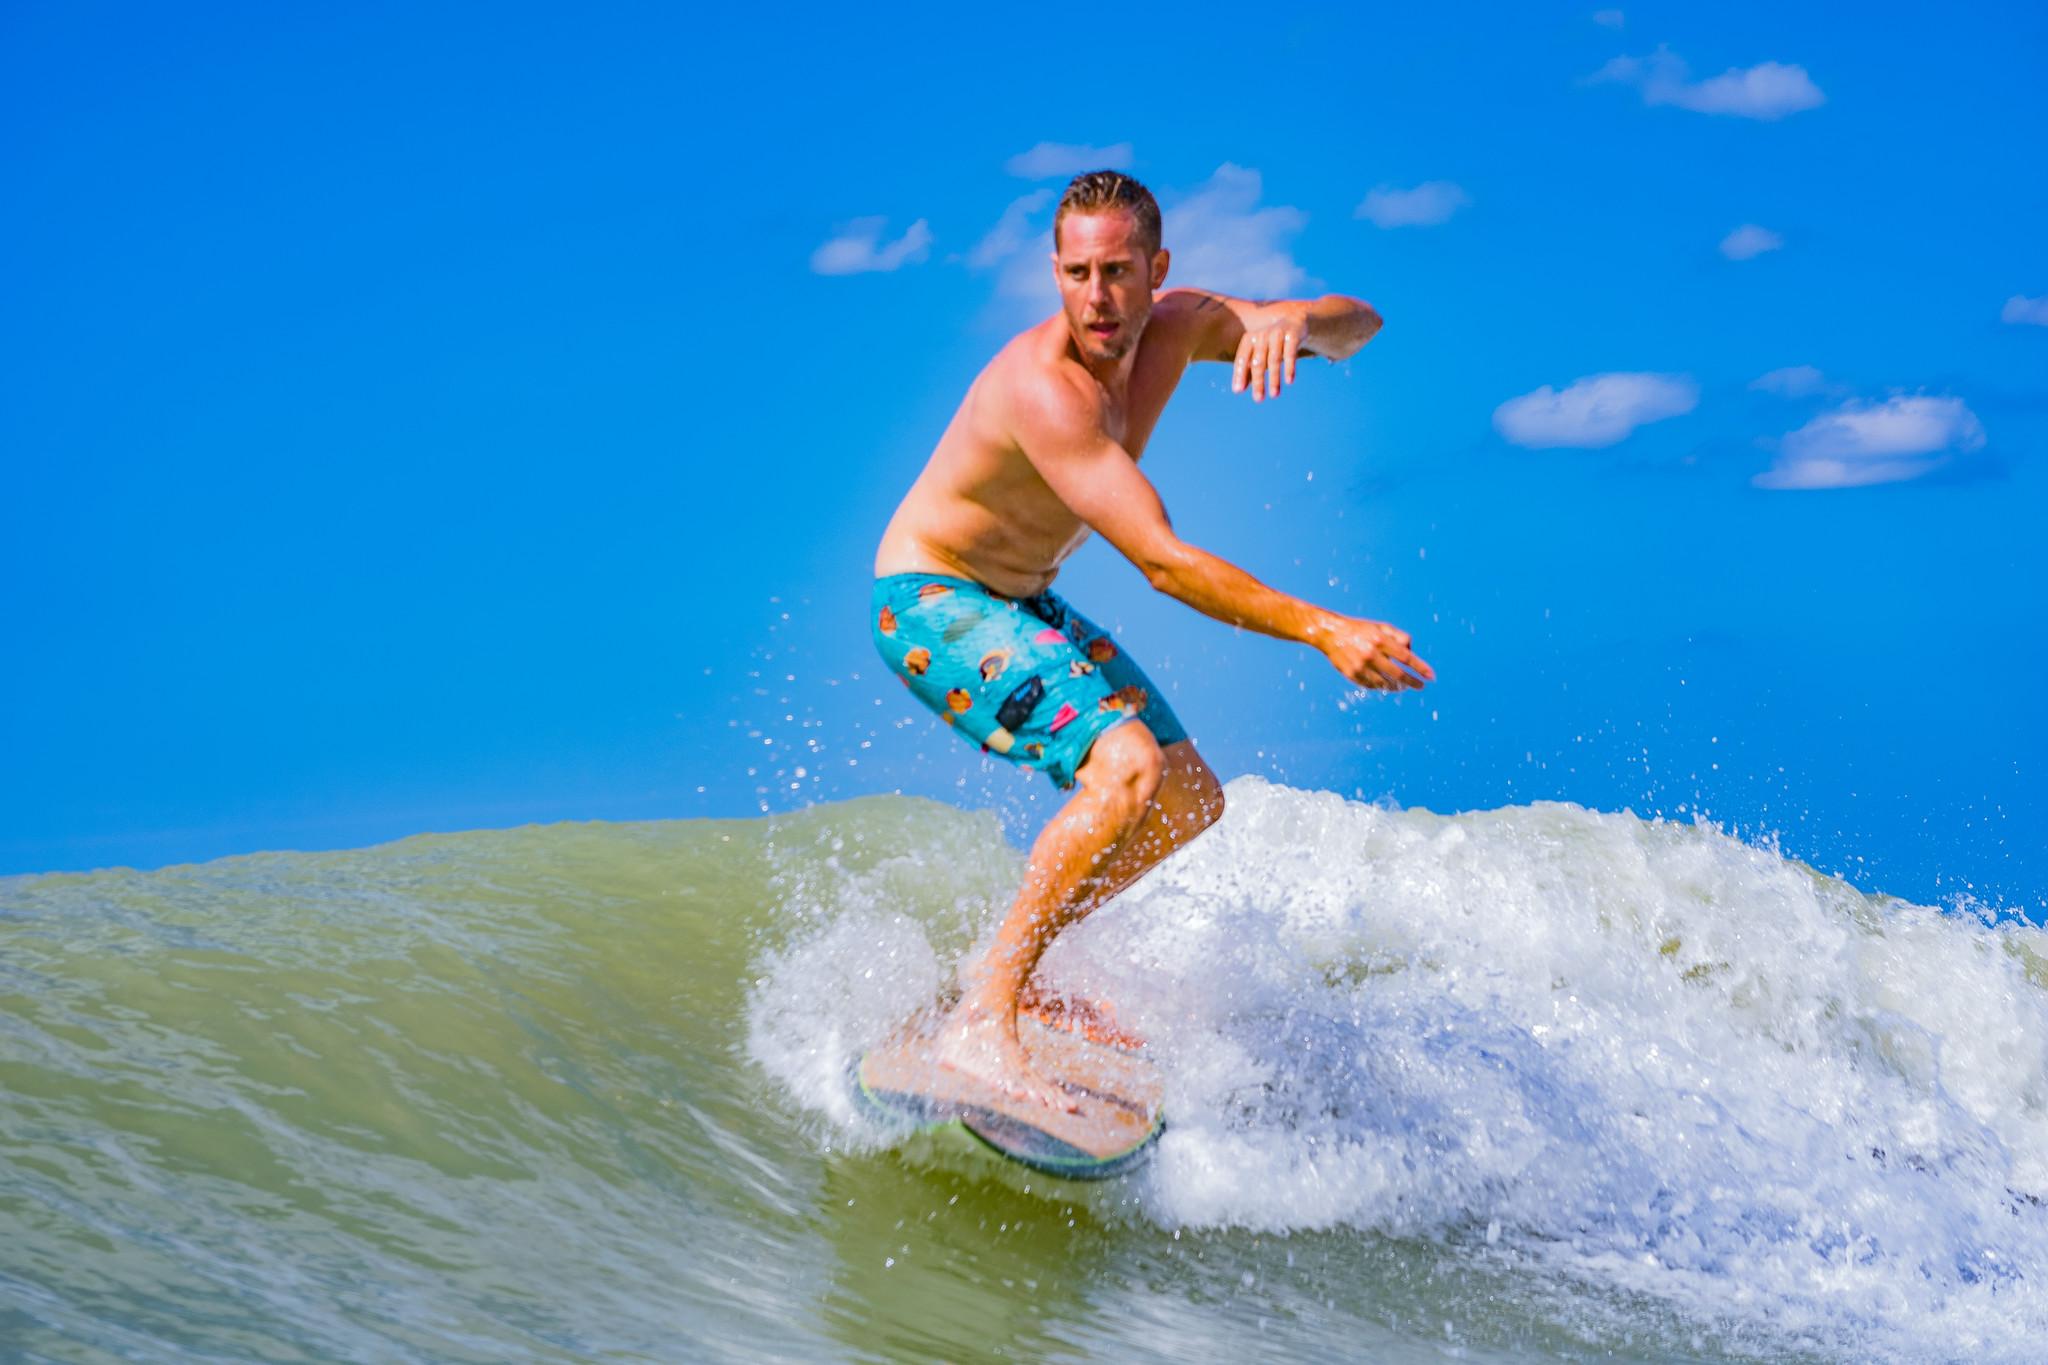 Jacob does a surfer boy